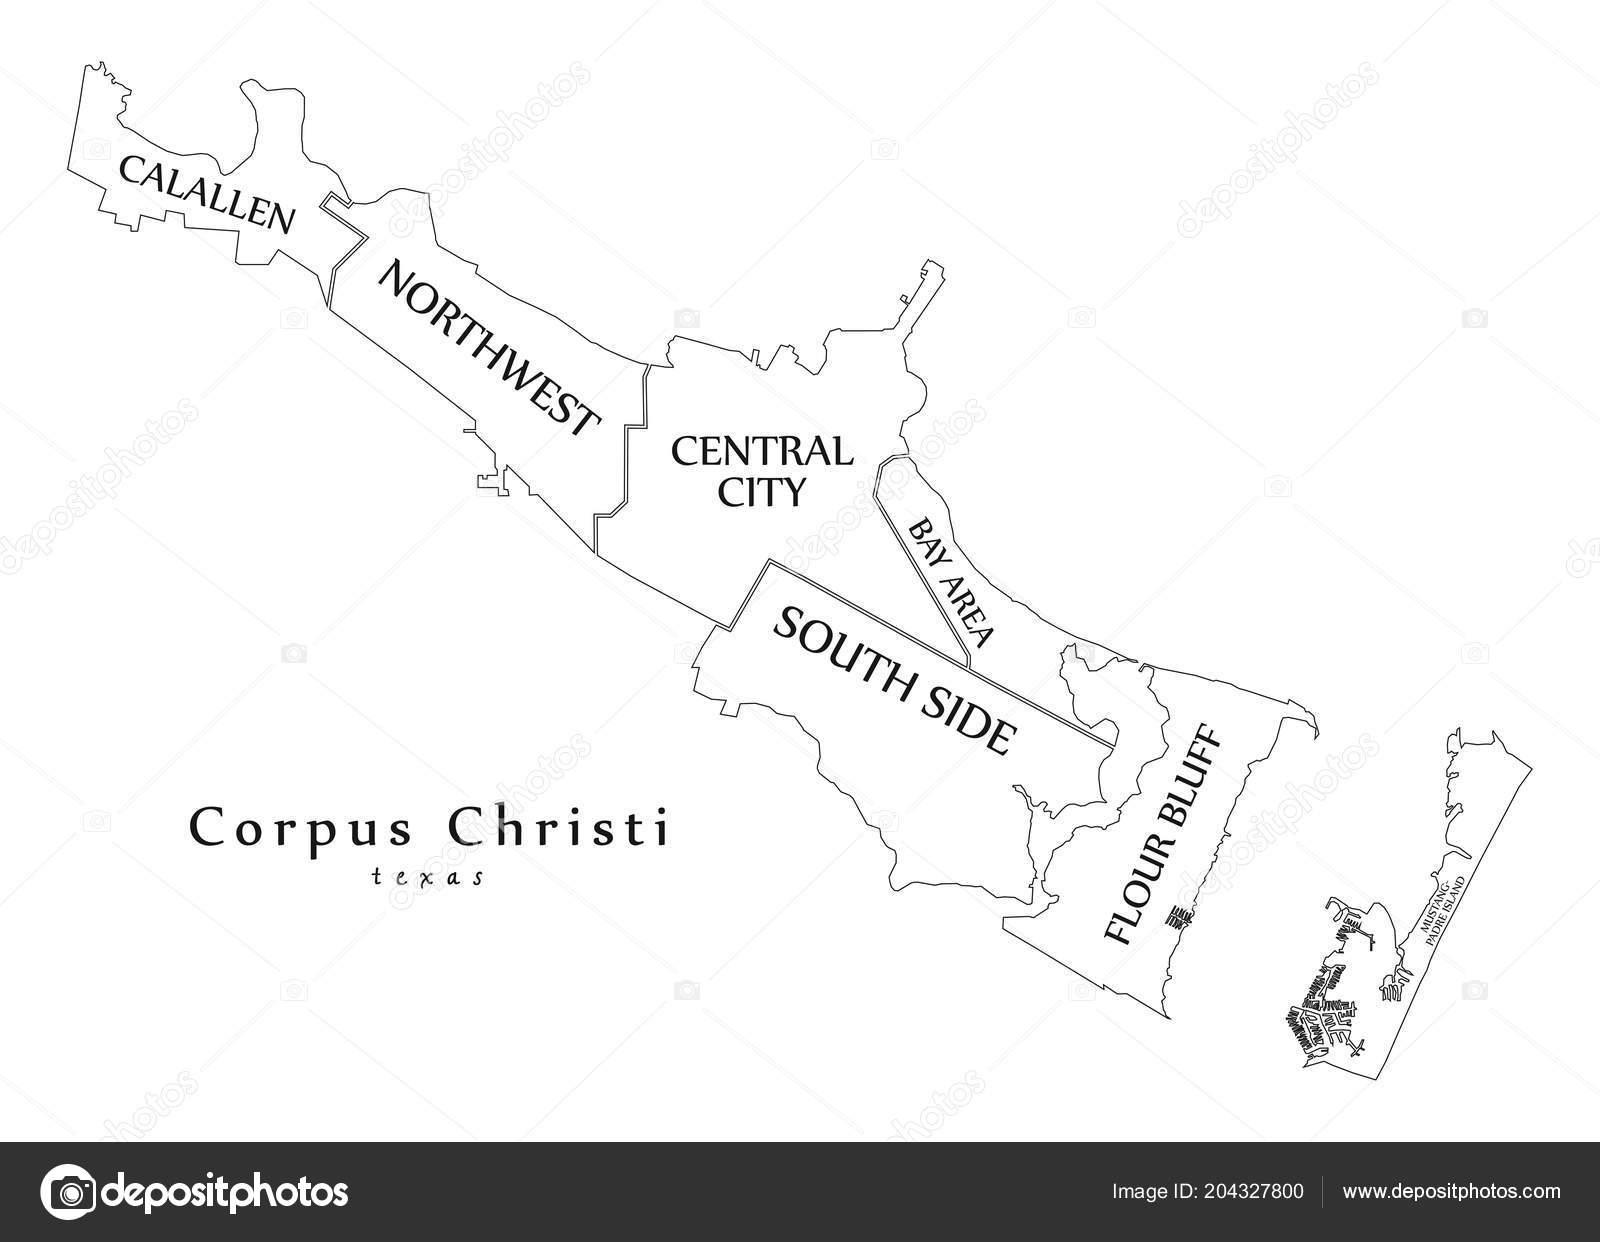 Modern City Map Corpus Christi Texas City Usa Neighborhoods Titles - City Map Of Corpus Christi Texas